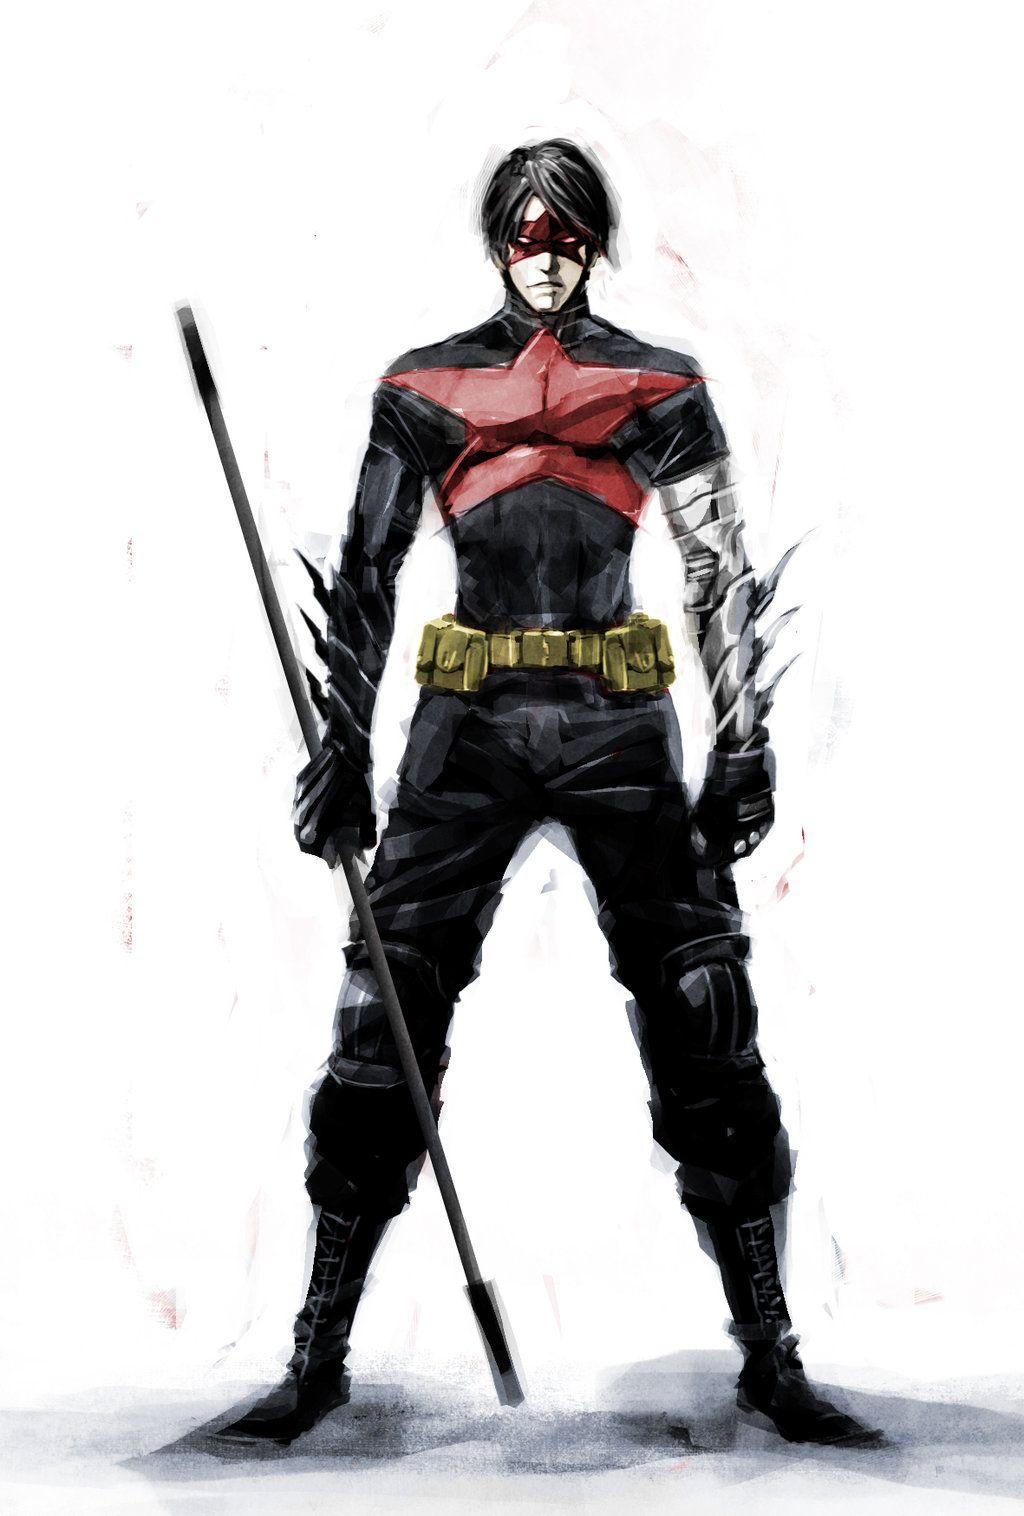 Winter Soldier Vs Red Hood